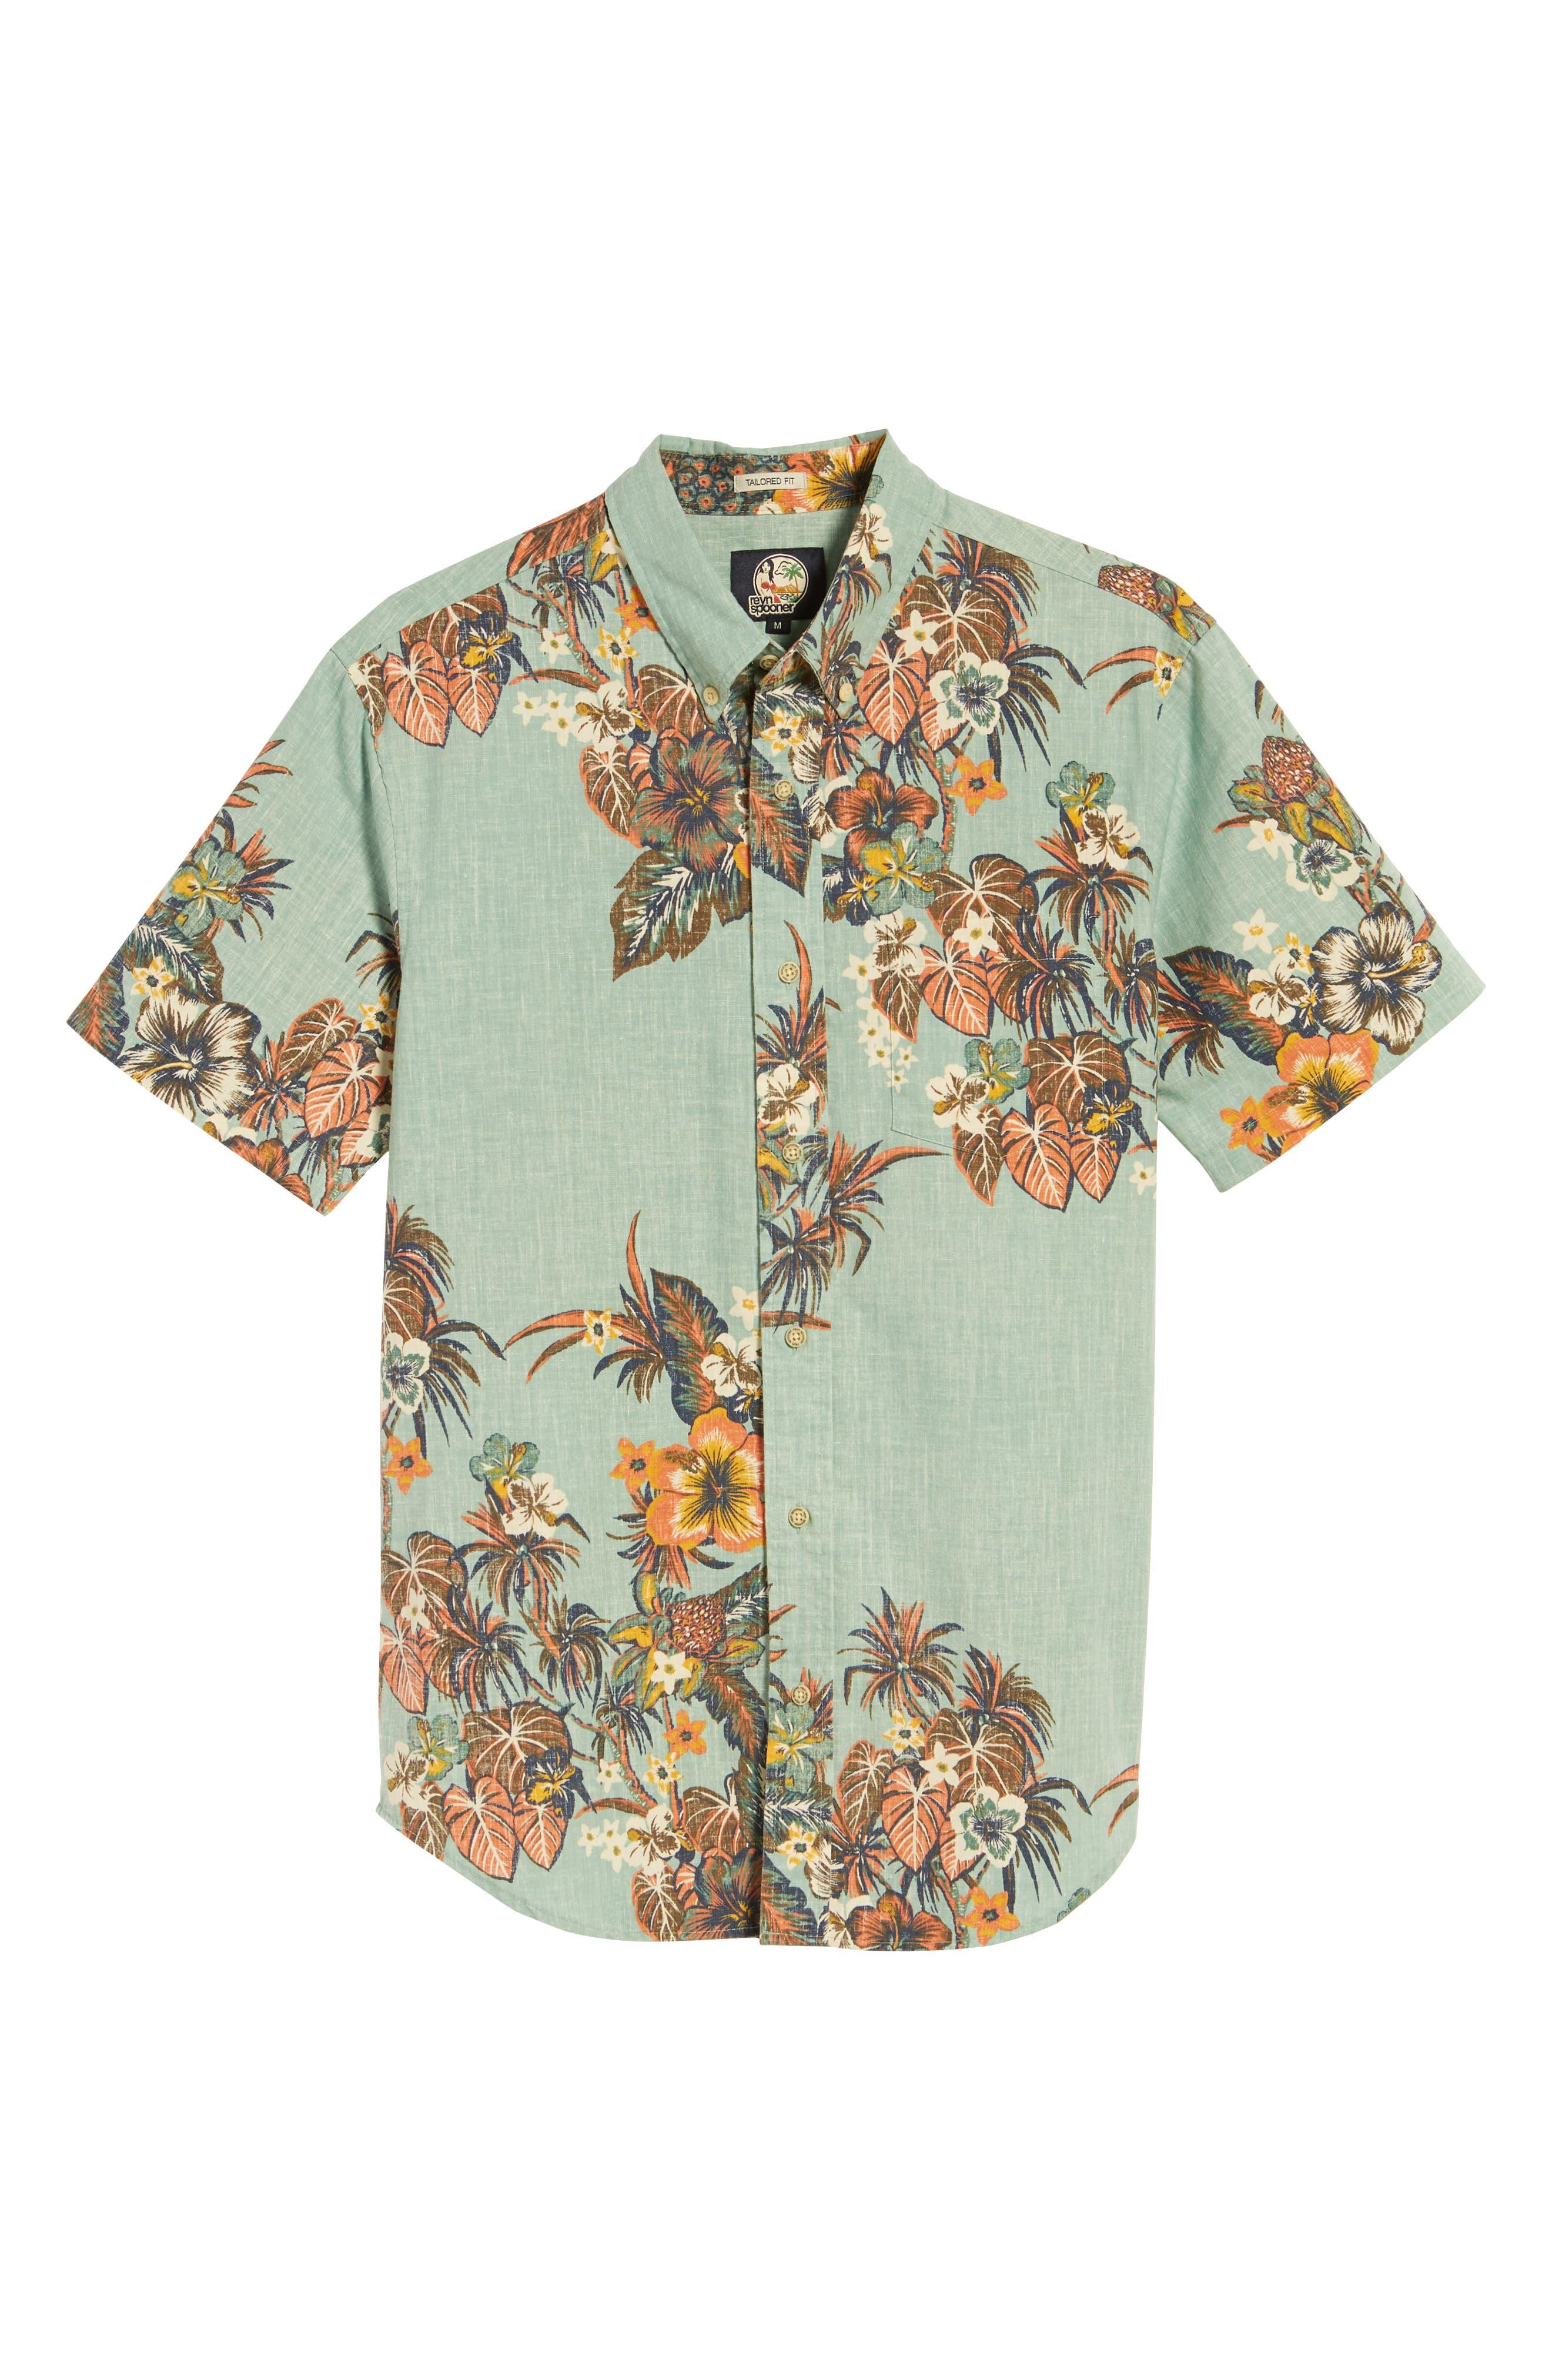 Pupas & Mai Tais Regular Fit Sport Shirt,                             Alternate thumbnail 6, color,                             BLUE 2